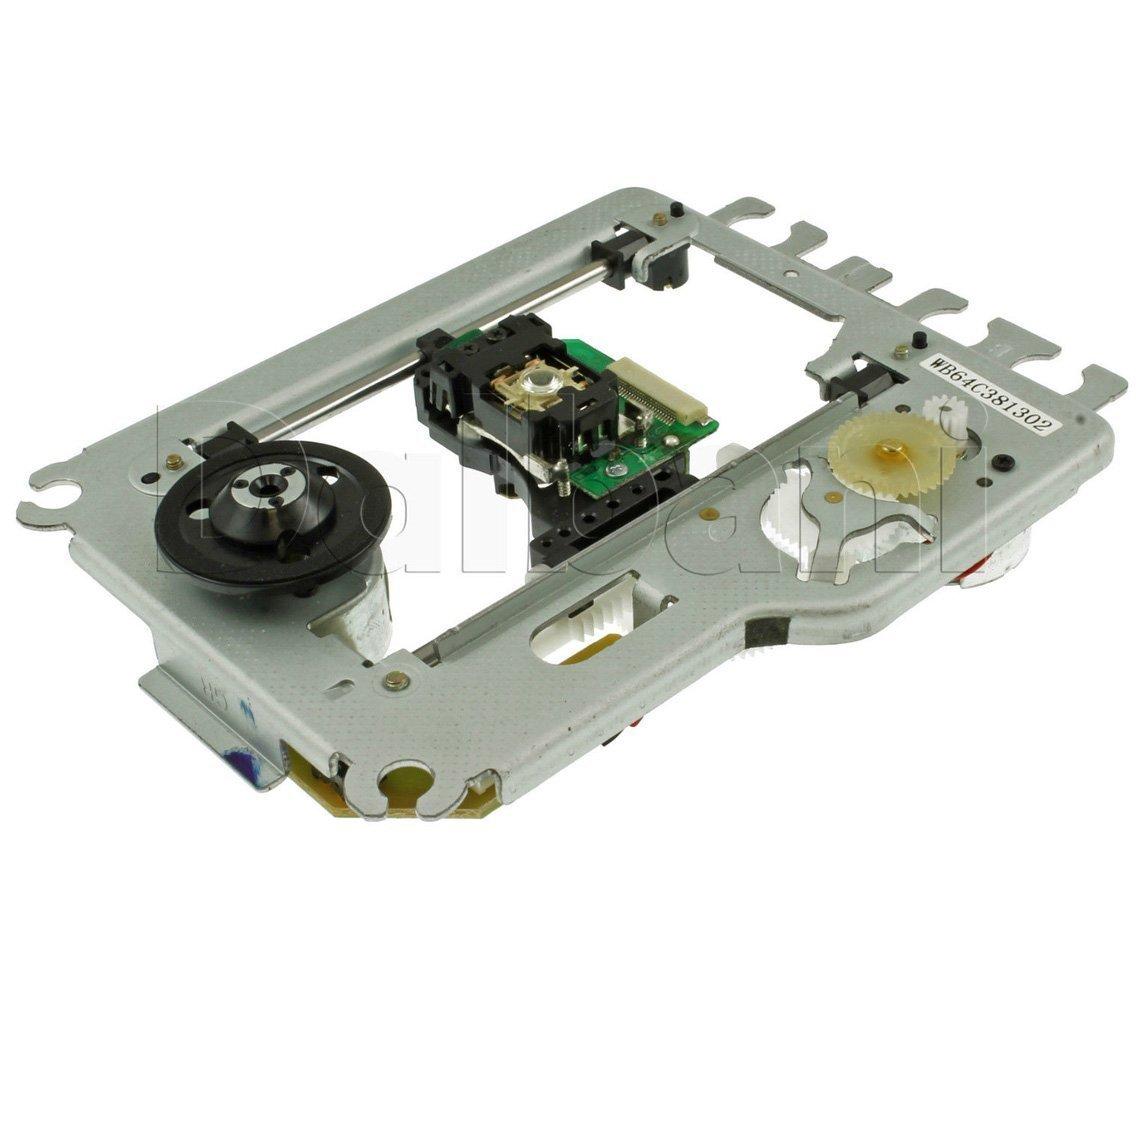 Puuli SOH-DL3CH Optical Pick Up DV34 Mechanism SOHDL3CH DVD Laser Lens Assembly